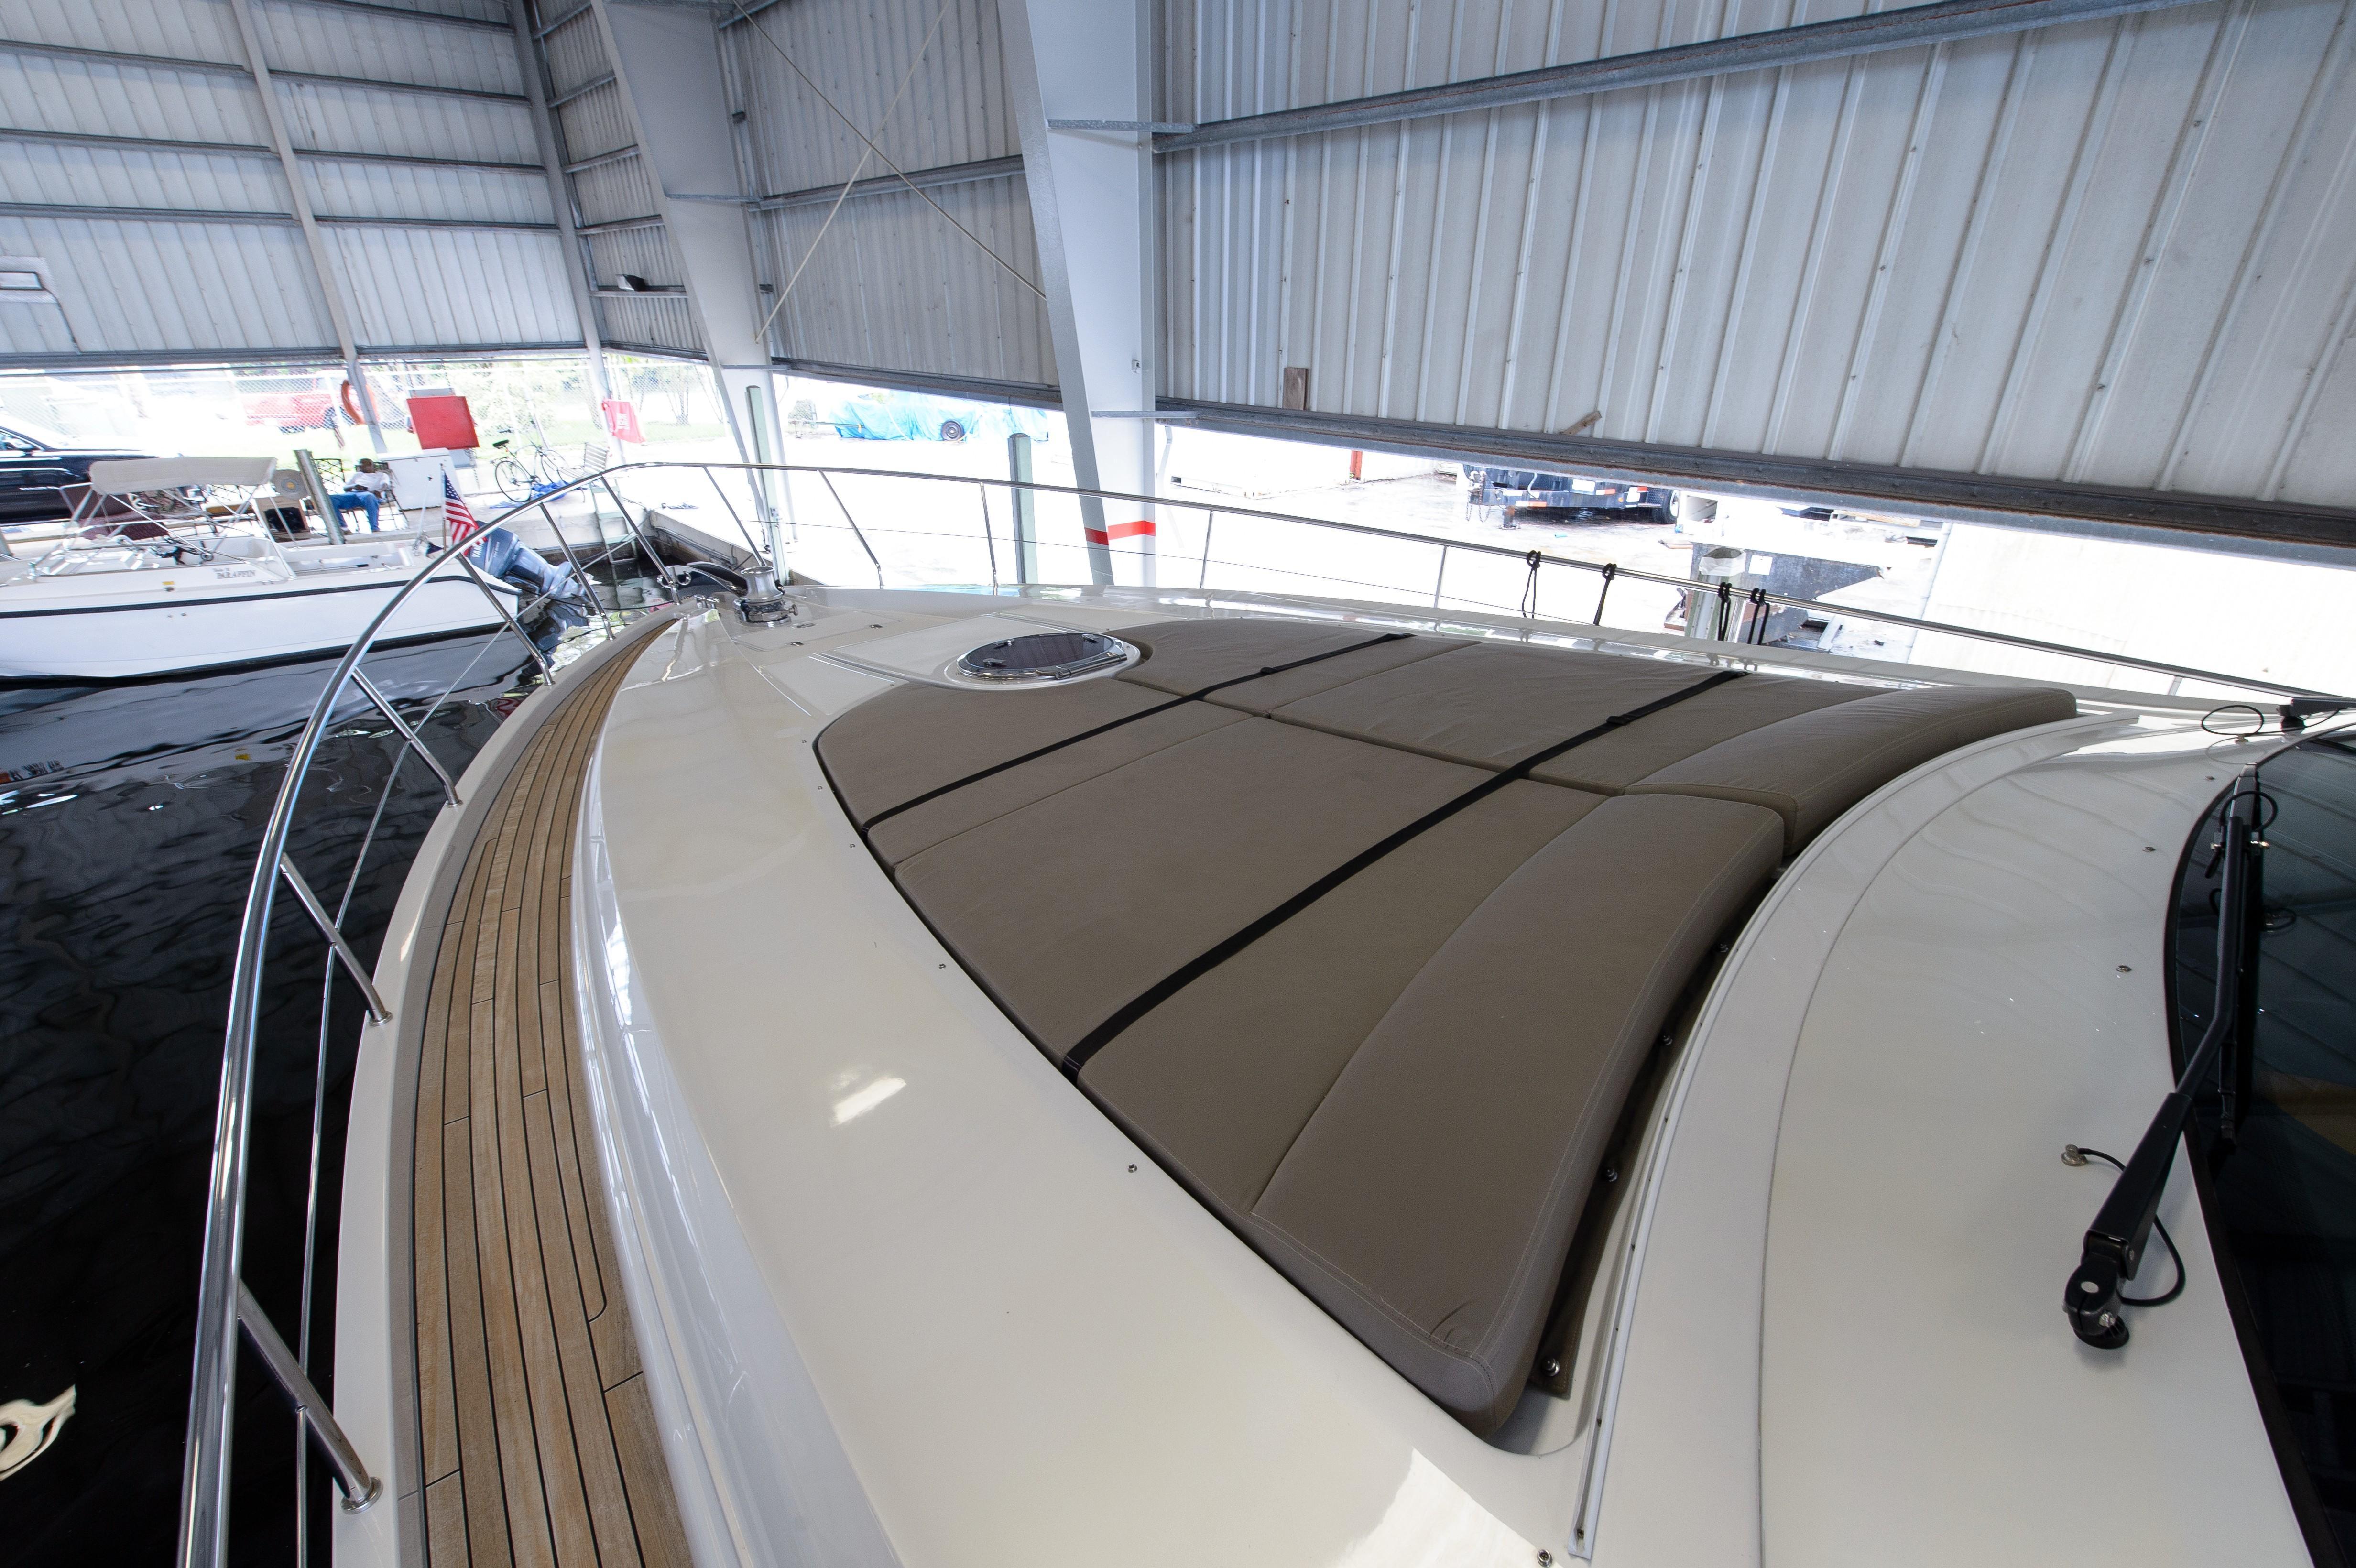 2012 Pershing 64 - Bow Sunpads